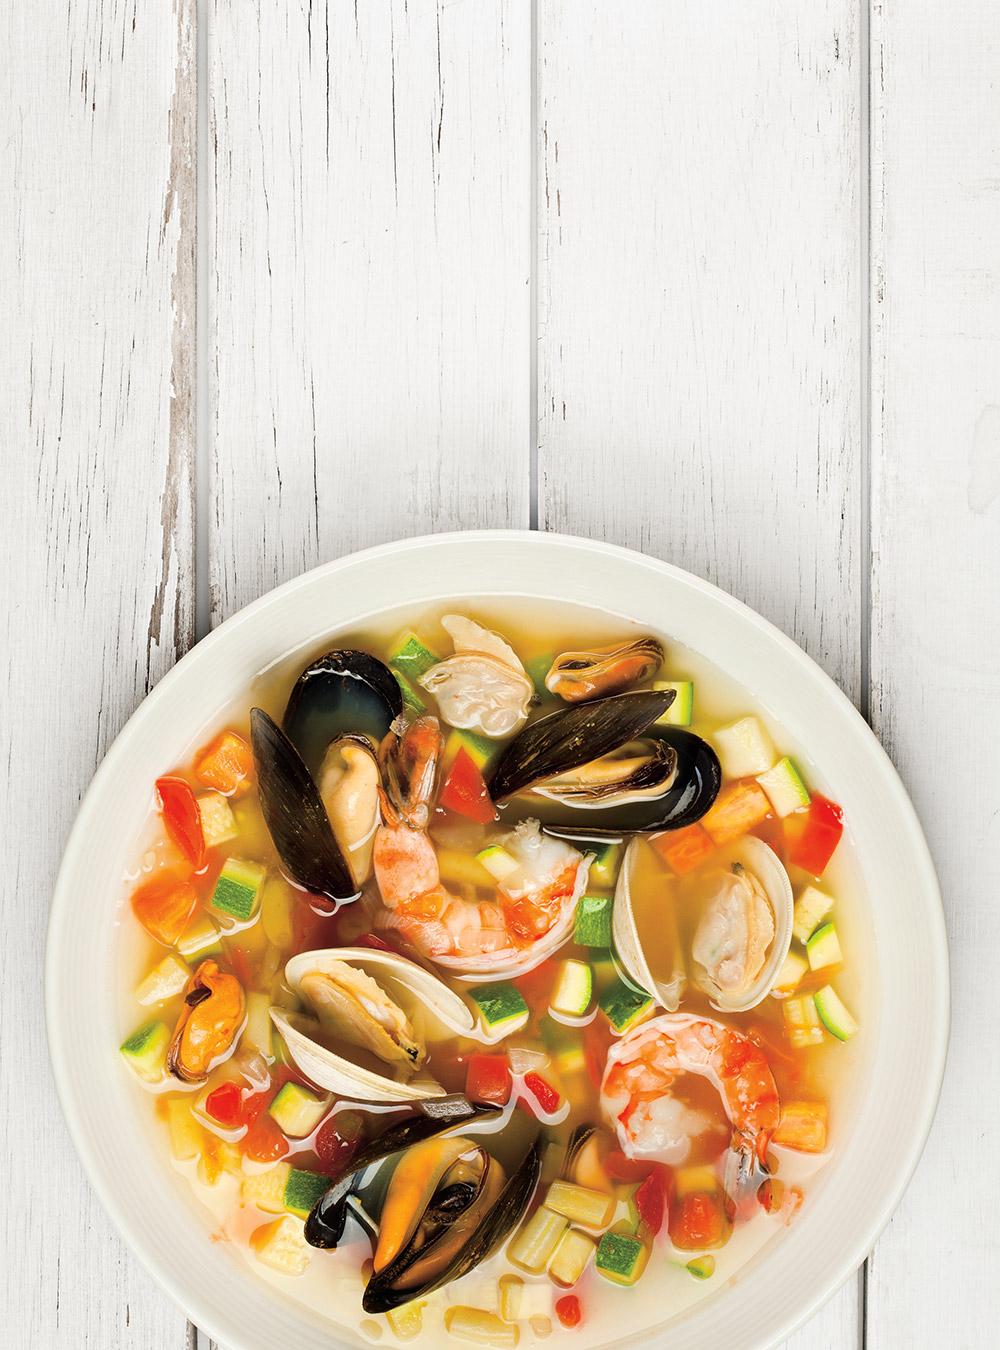 Minestrone d 39 t aux fruits de mer ricardo - Ricardo cuisine mijoteuse ...